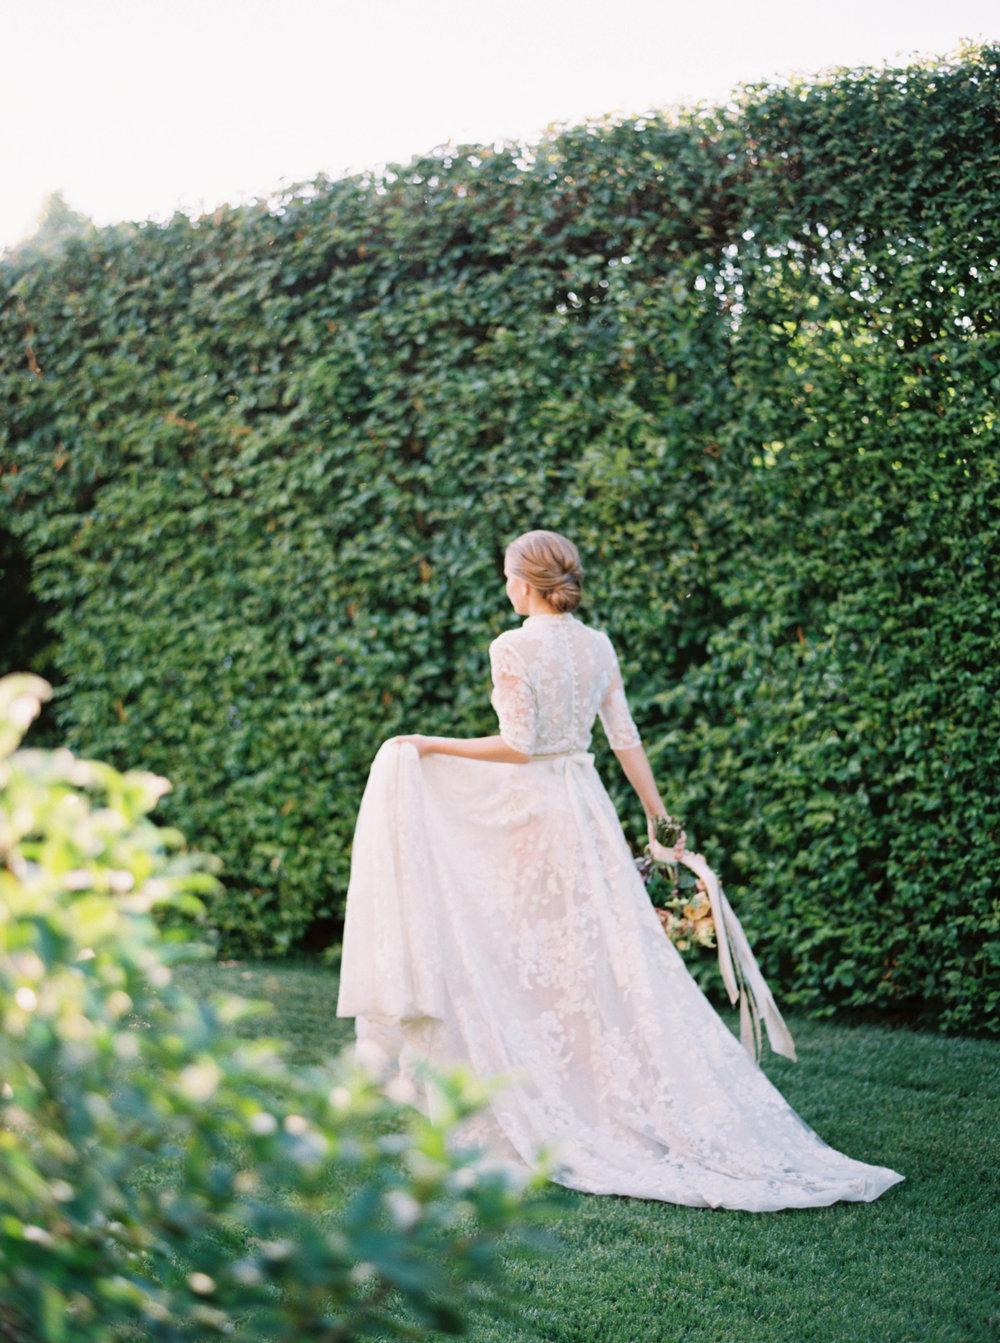 JennyQuicksallPhotography_www.jennyquicksall.com_KestlerPark_SantaYnezCalifornia_JoyProctor(25).jpg